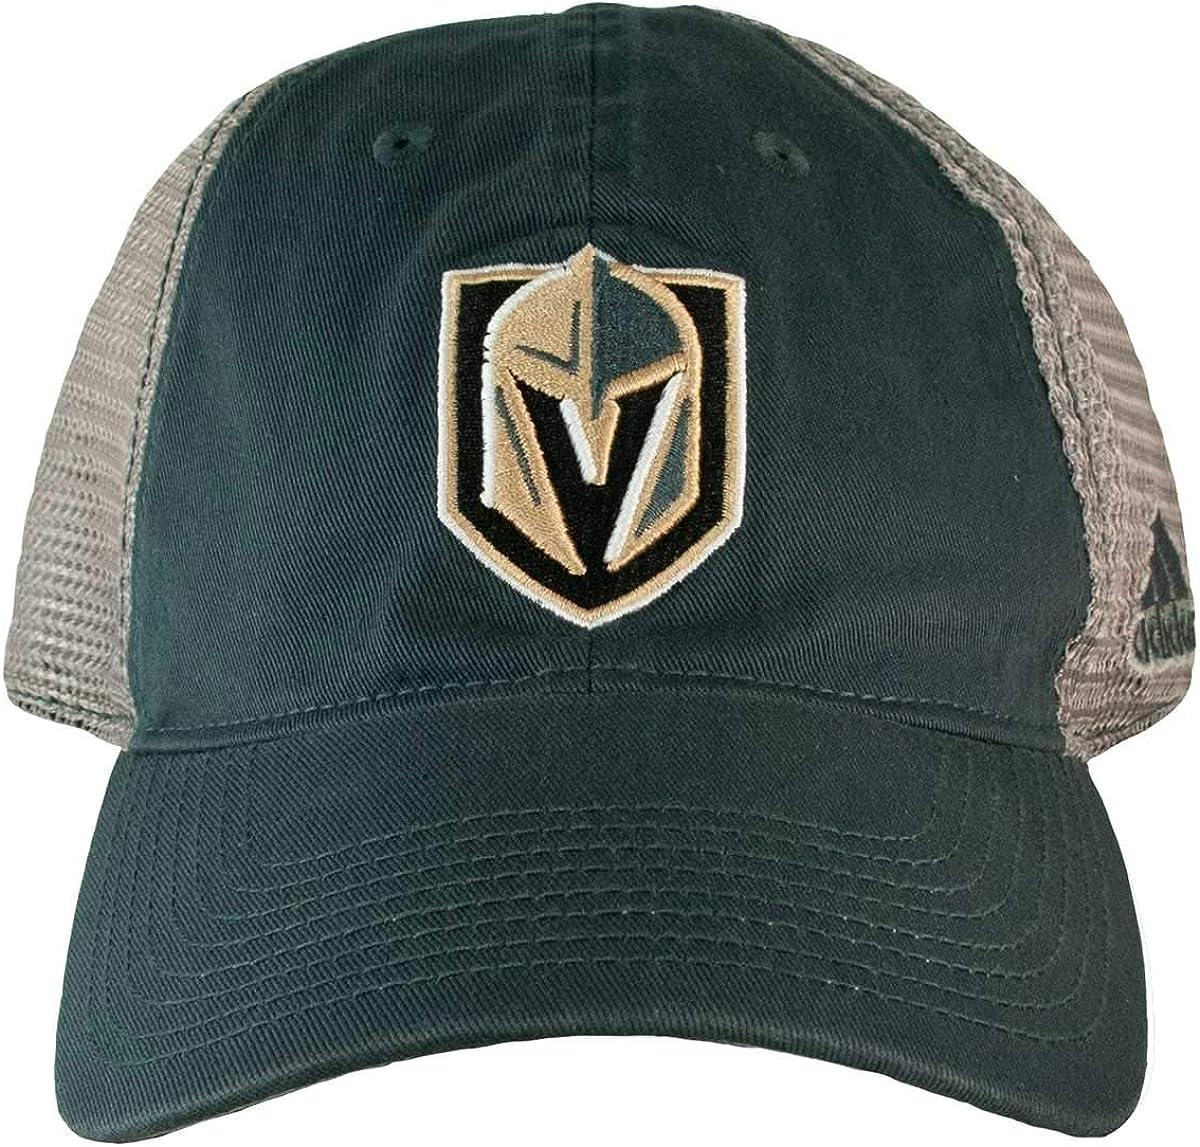 Guduss Soundgarden Starry Sky Hat Baseball Cap Sports Cap Adult Trucker Hat Mesh Cap